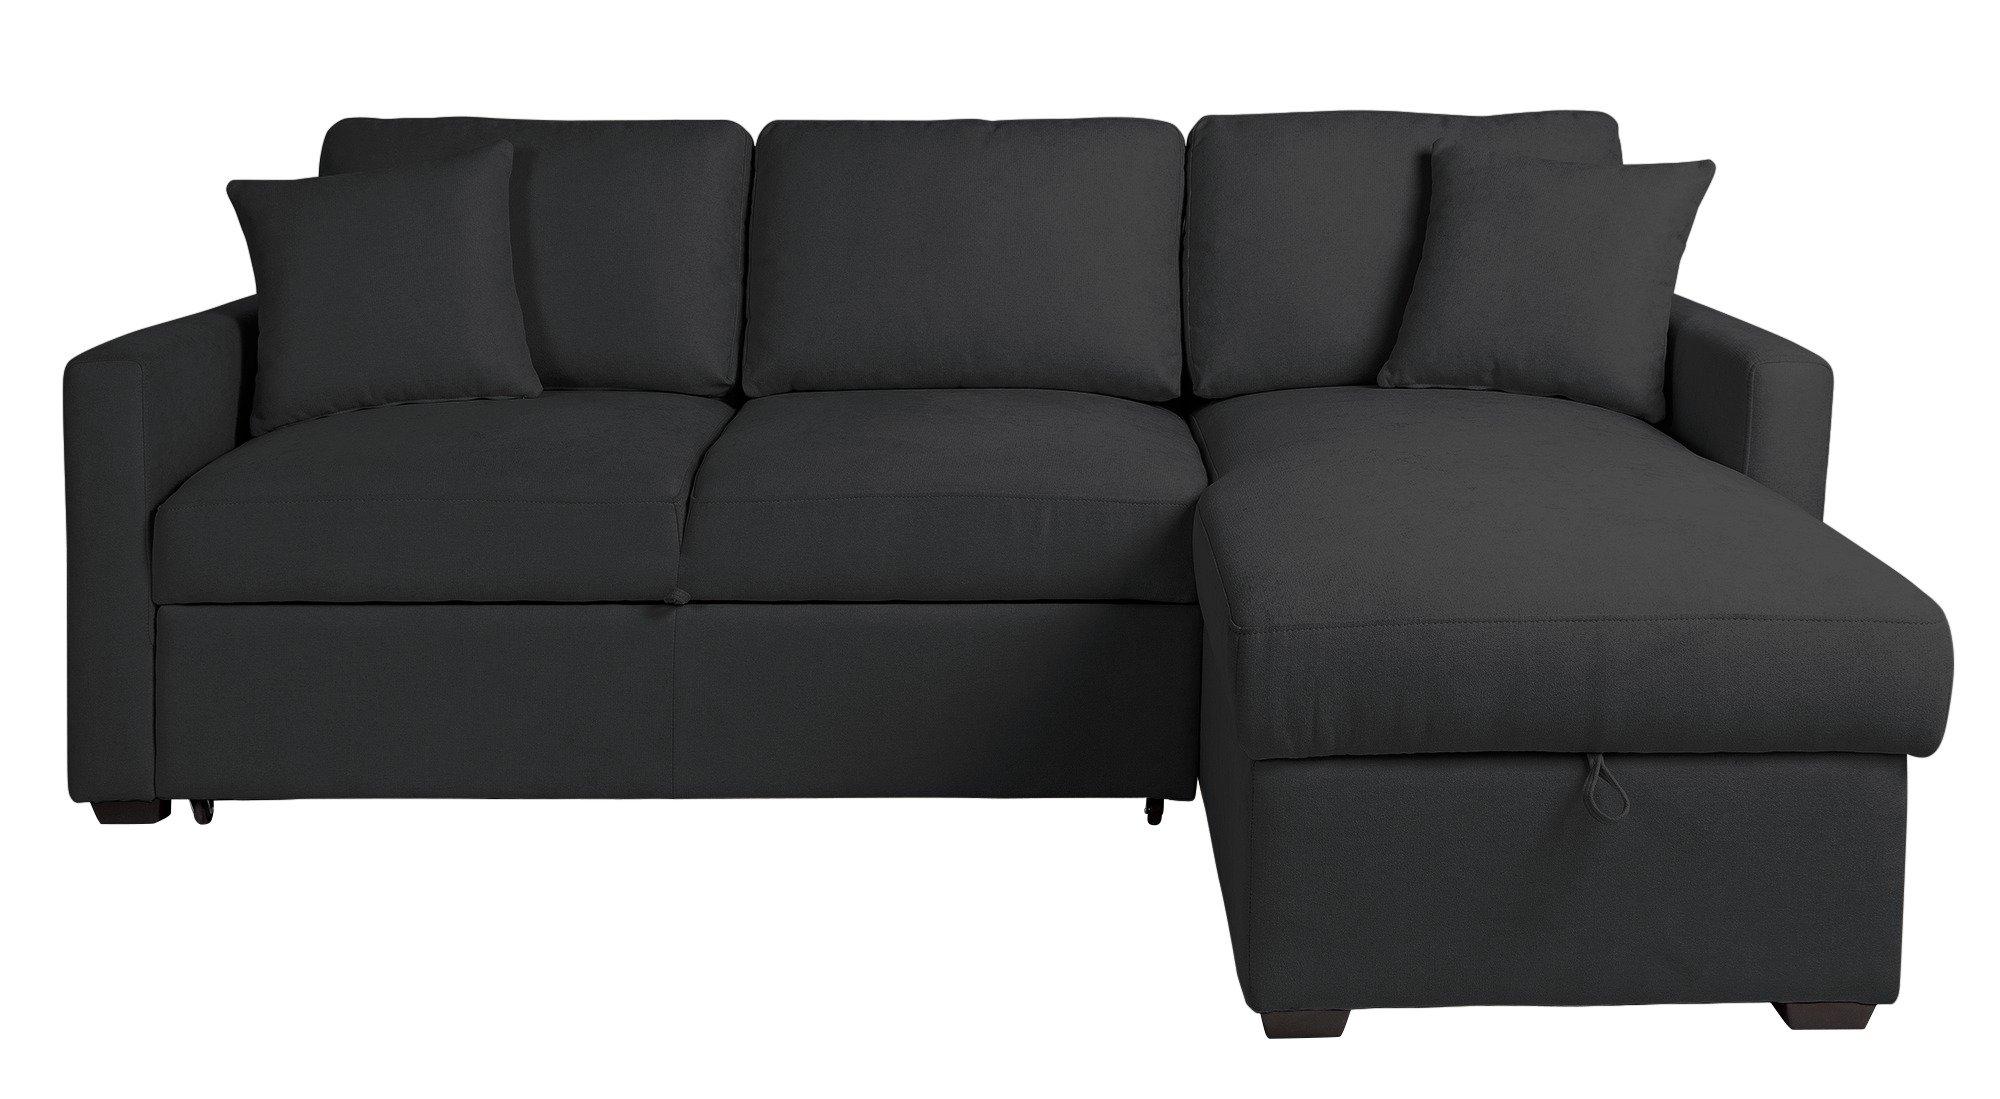 Buy Argos Home Reagan Right Corner Fabric Sofa Bed - Charcoal